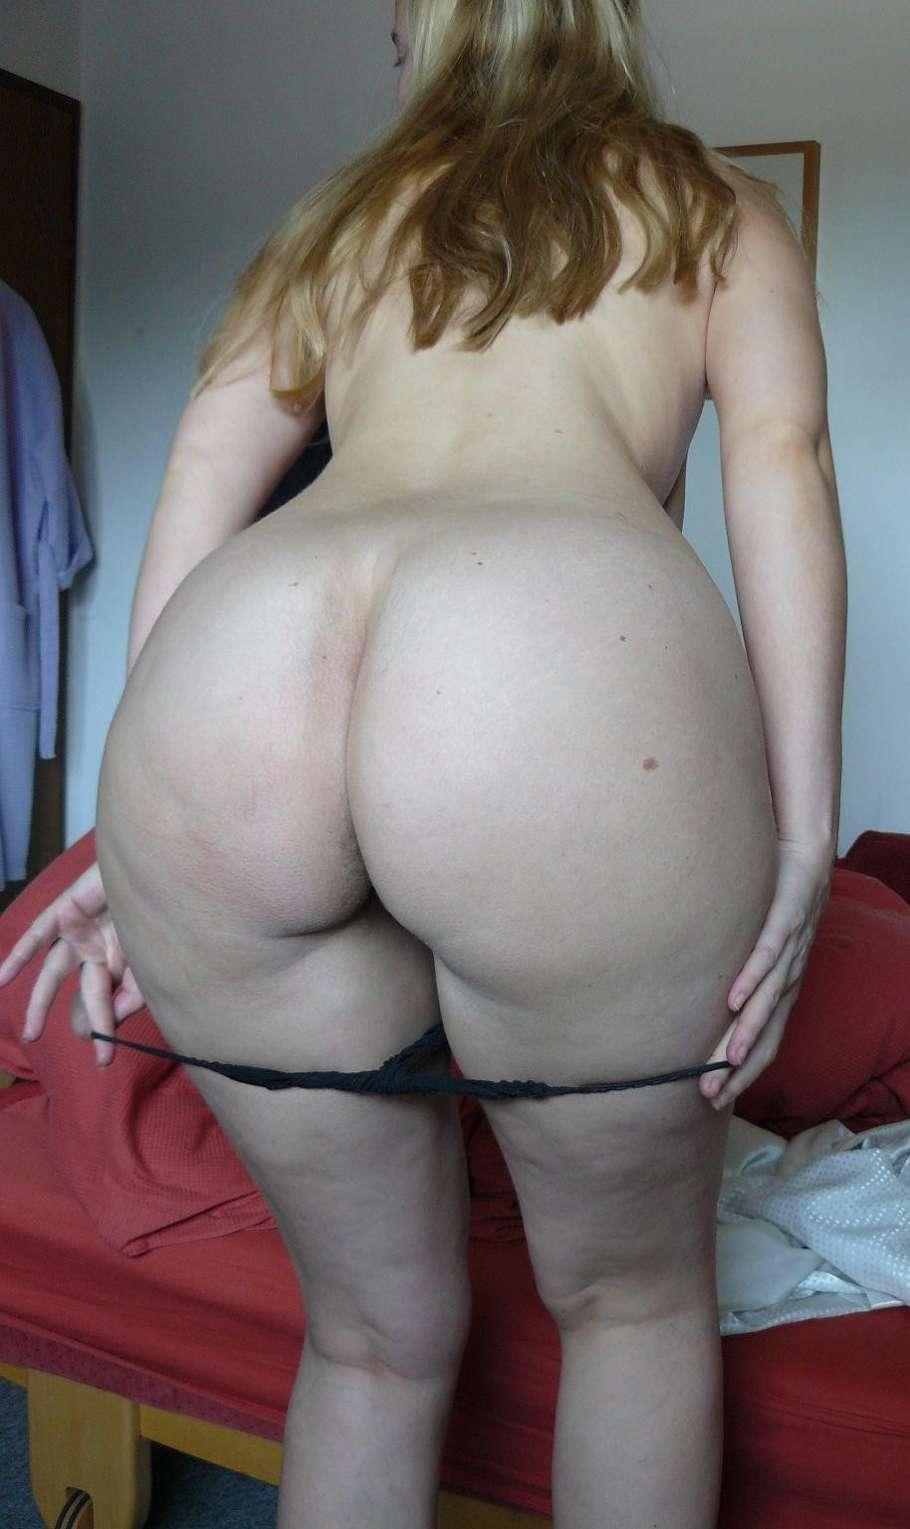 scopate brasiliane video porno di pamela anderson